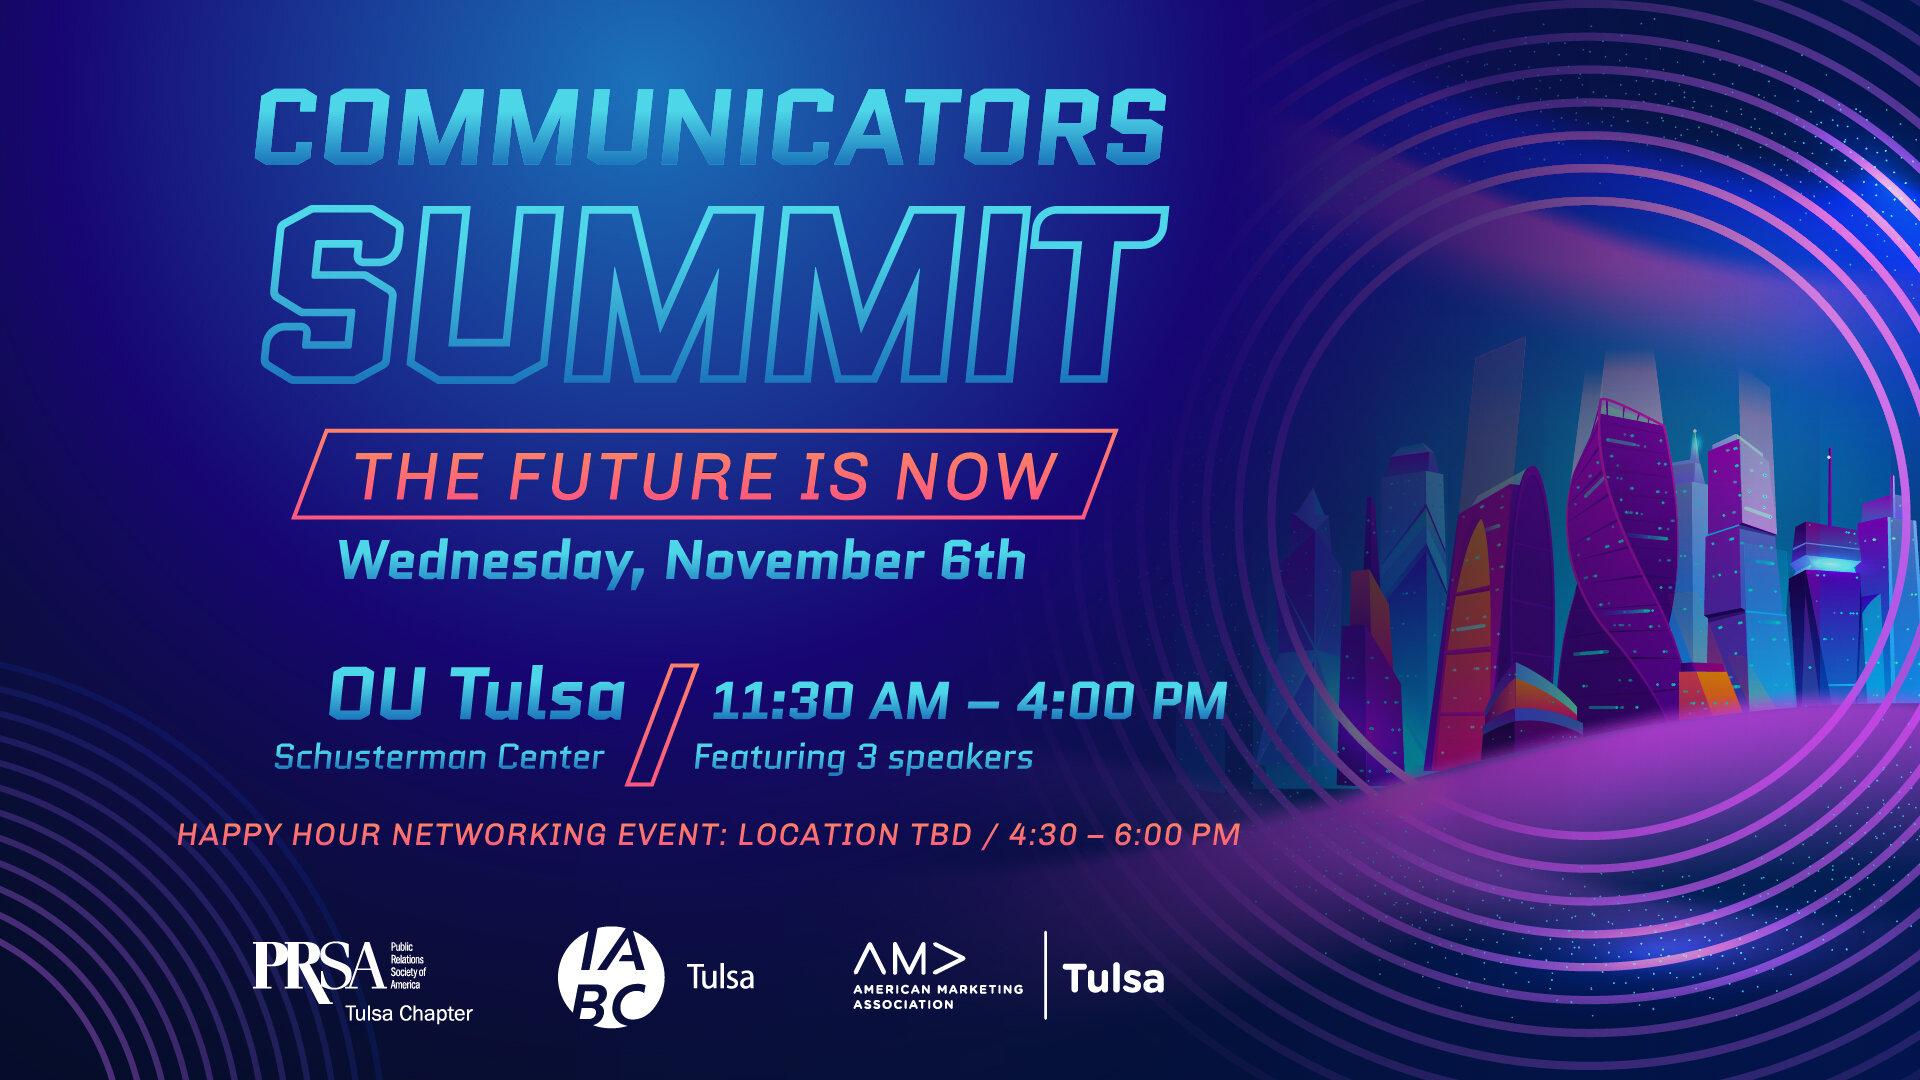 19-2187 IABC 2019 Communicators Summit Event Banners_FACEBOOK.jpg